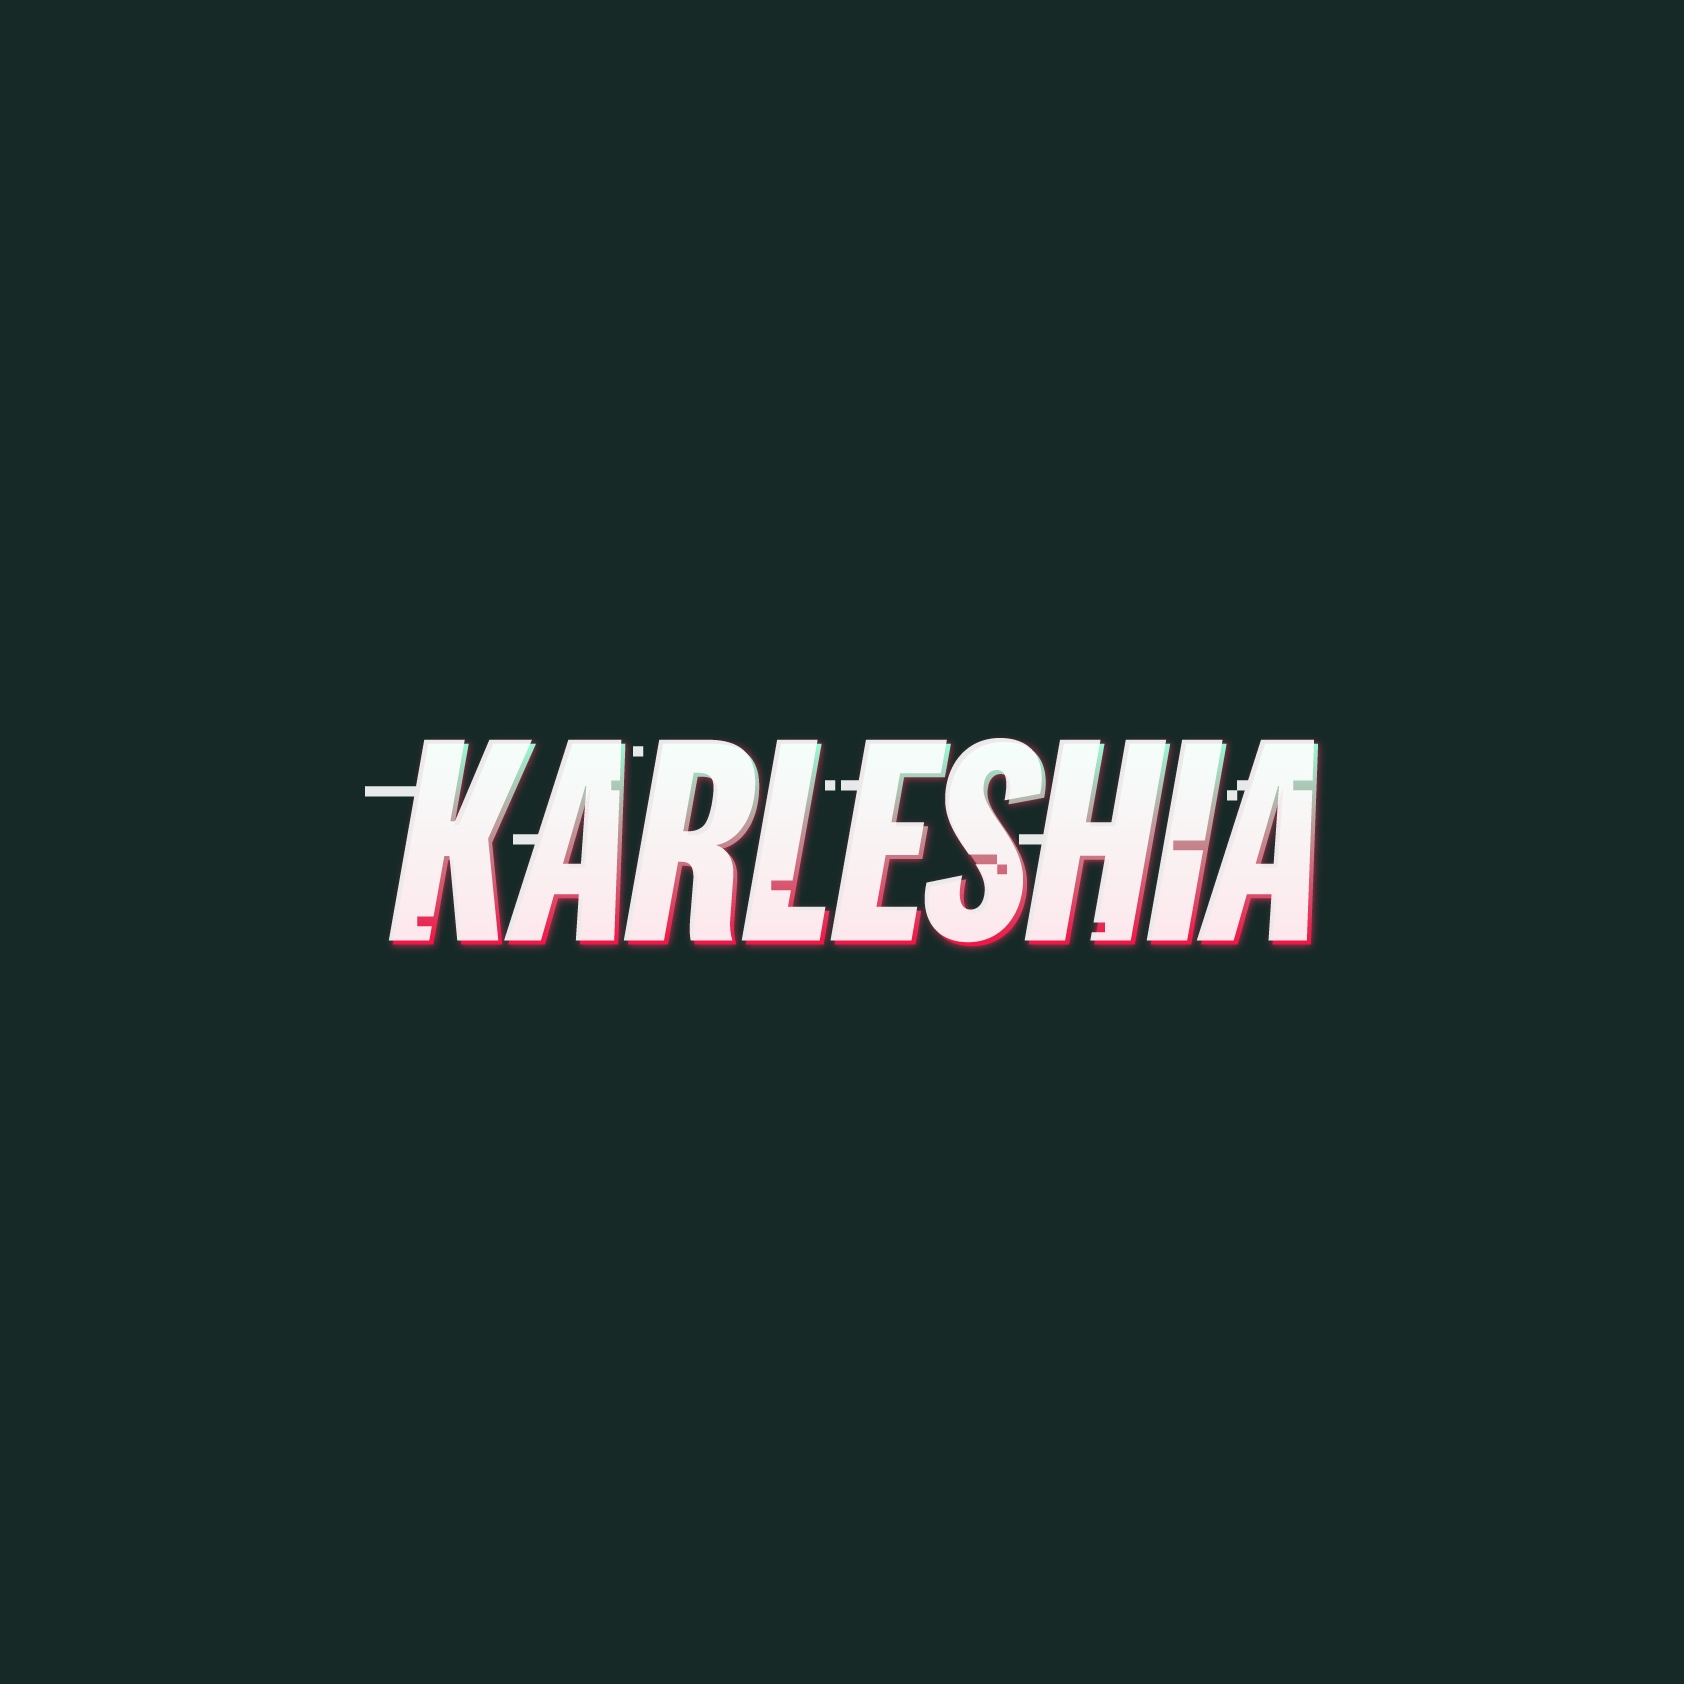 karleshia-branding.jpg